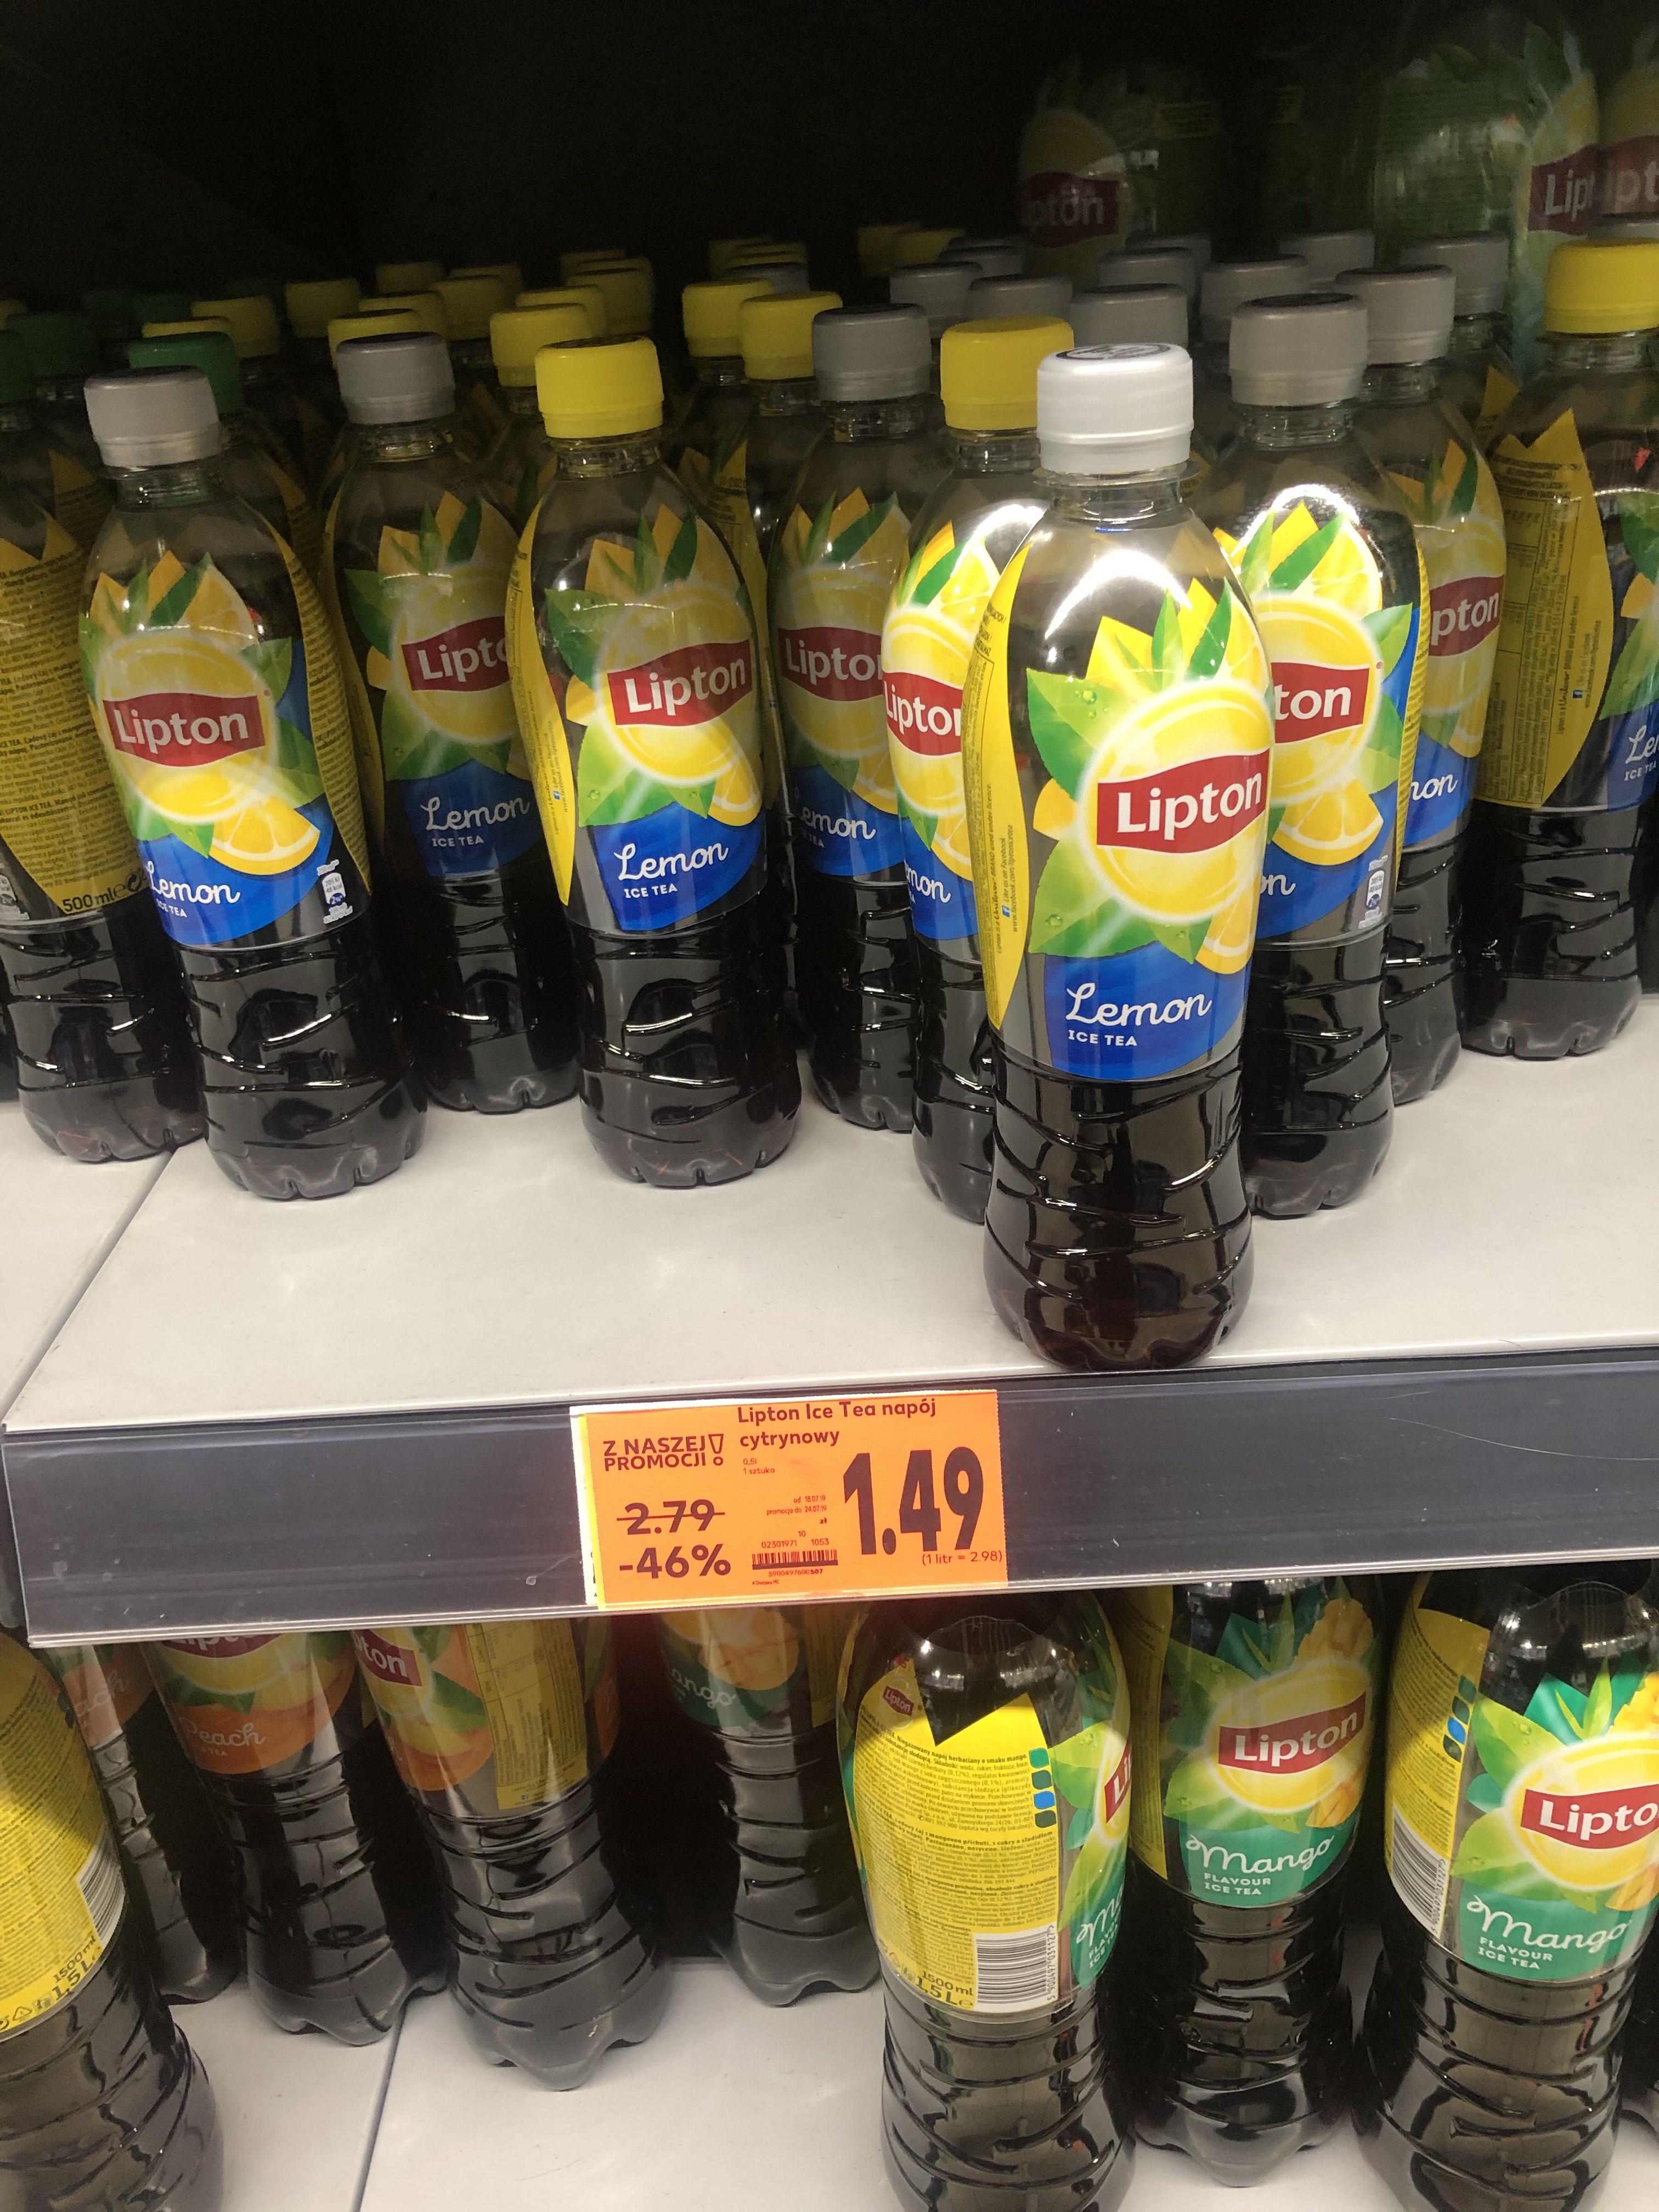 Lipton Ice Tea 0.5L po taniości Kaufland